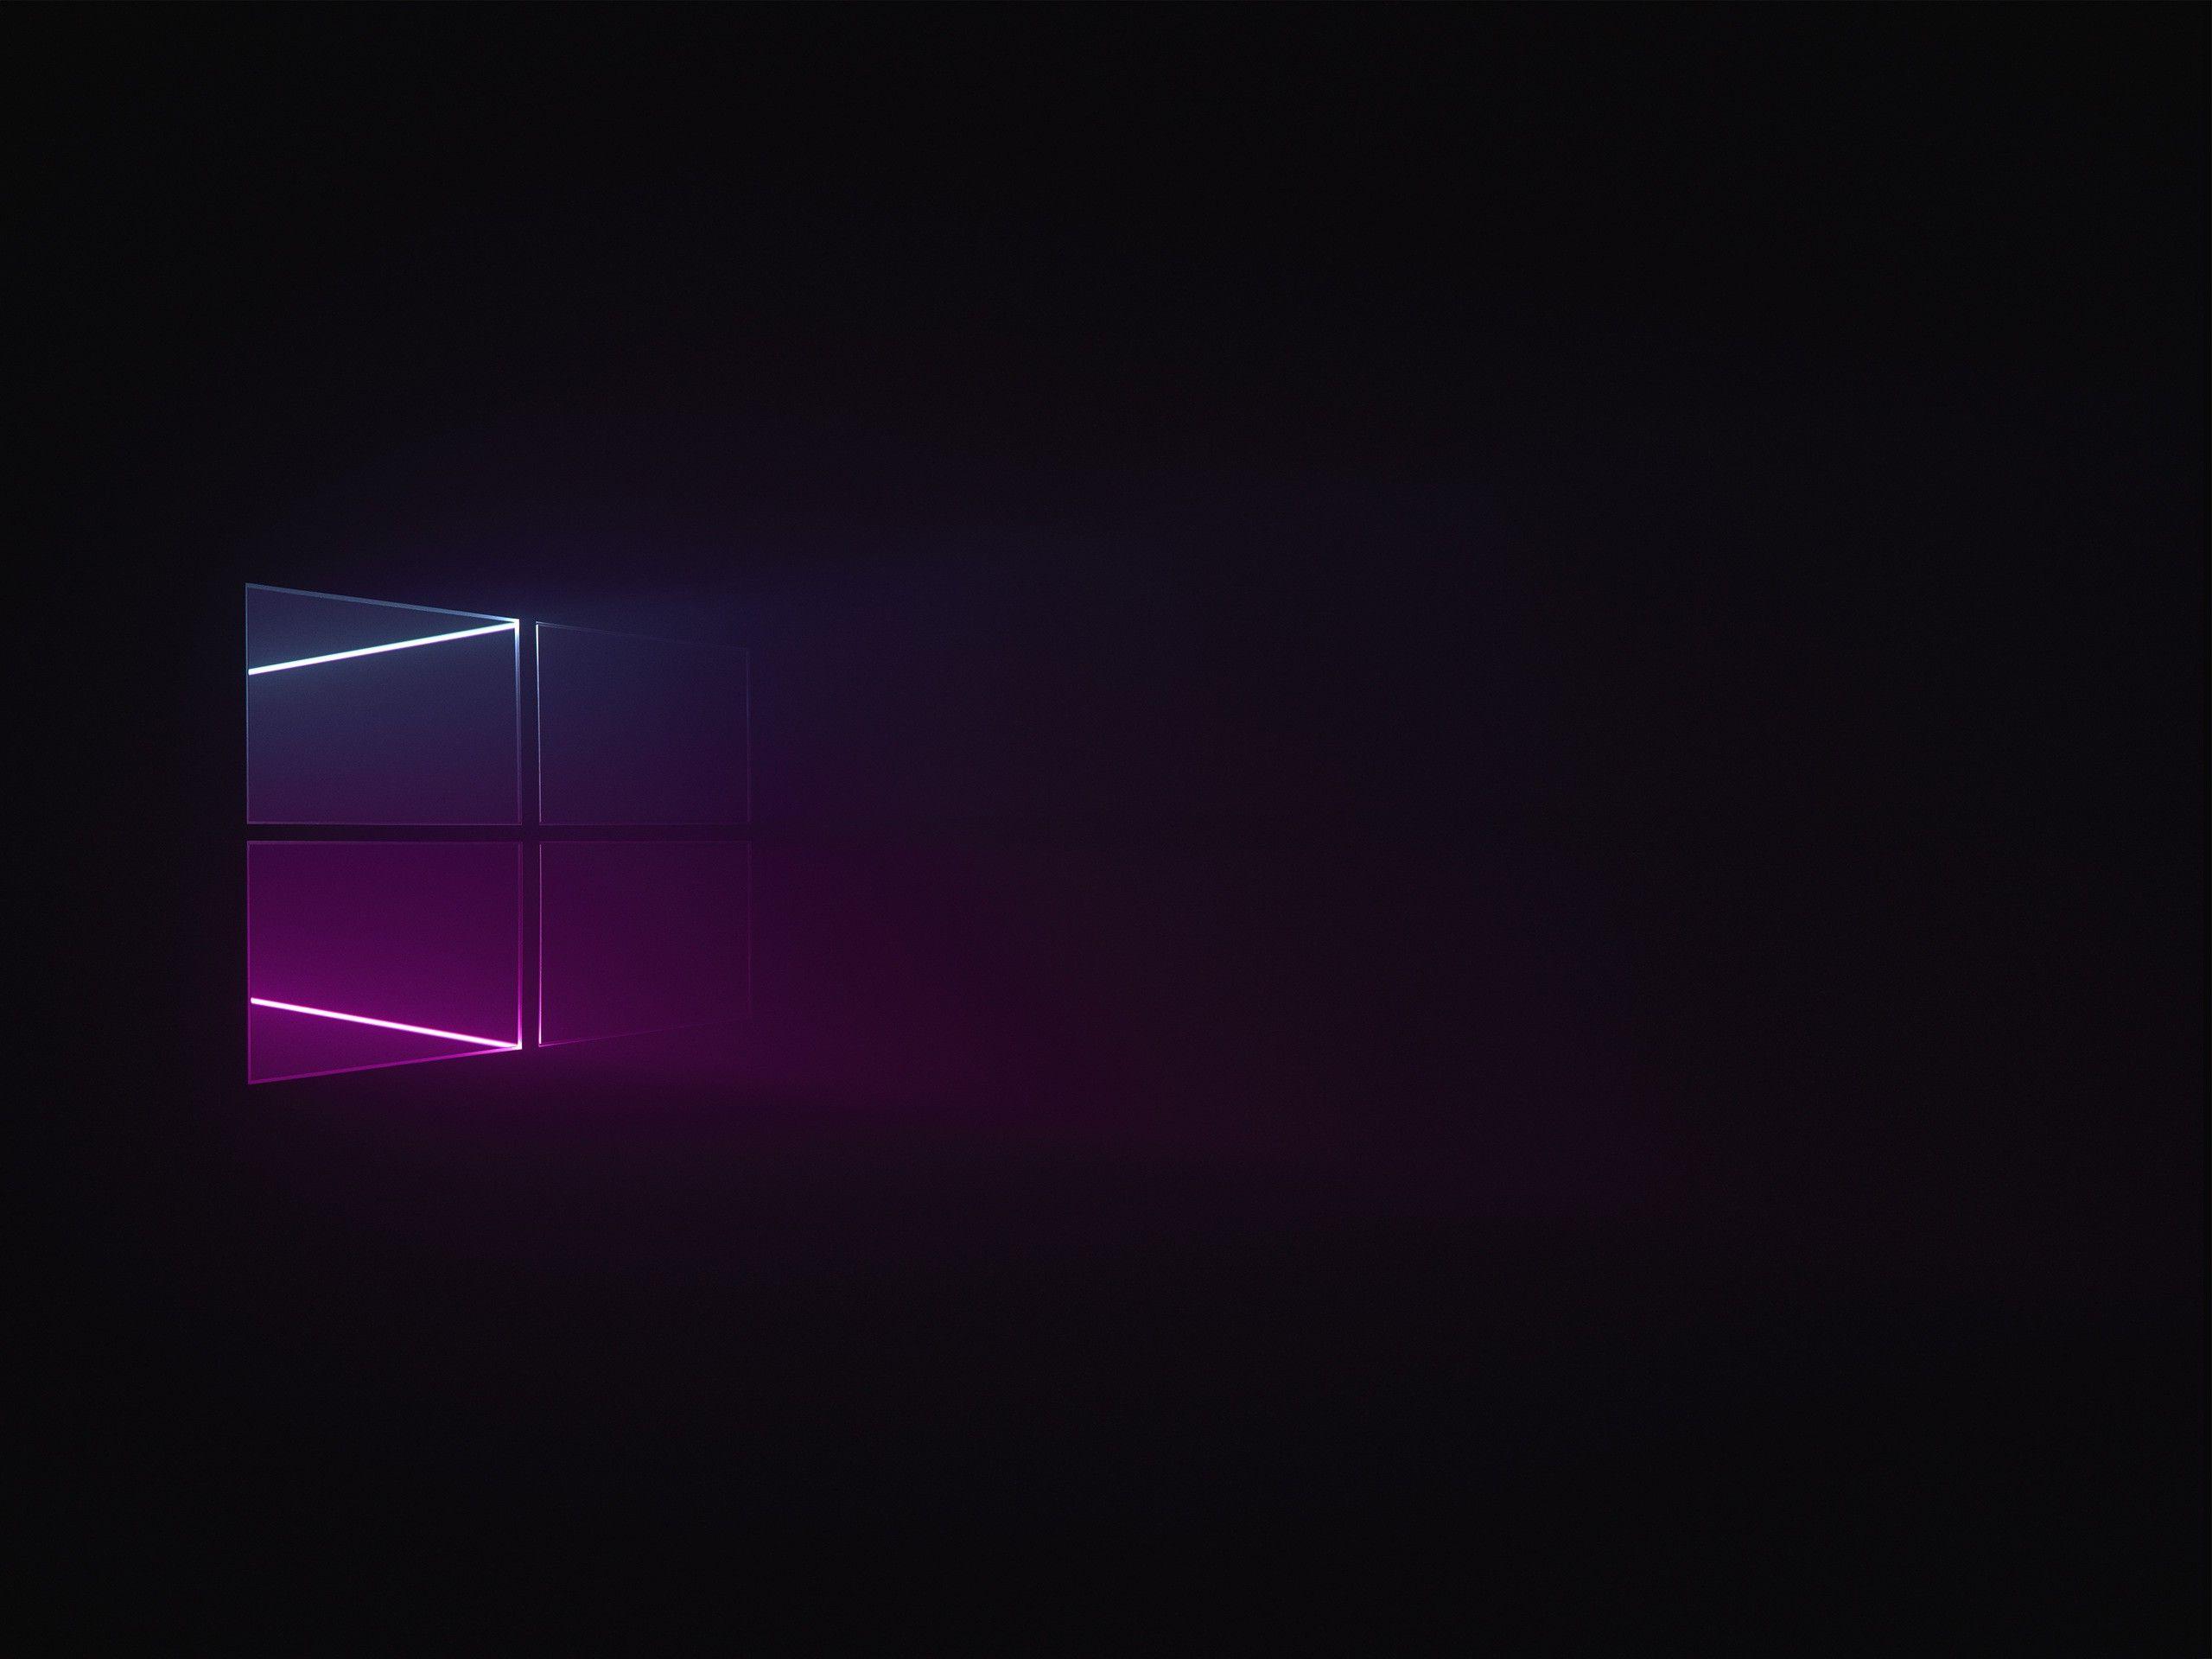 Microsoft Windows Abstract Windows Vista Wallpapers Hd Desktop